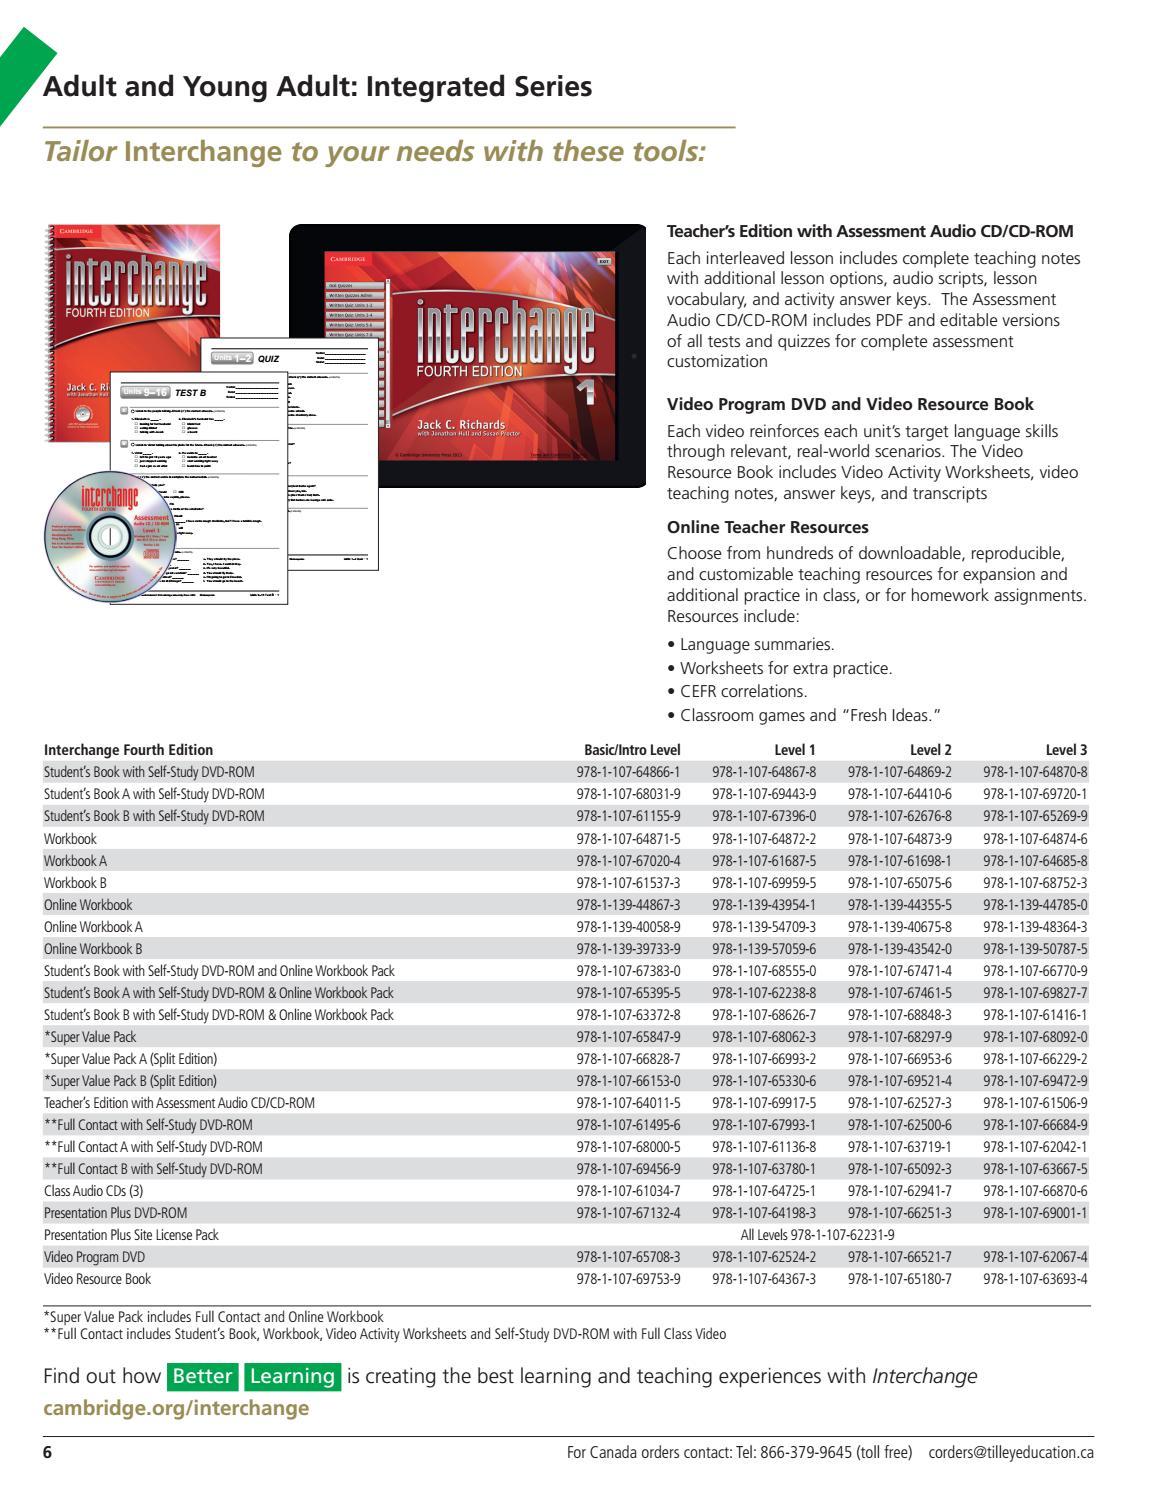 Workbooks interchange fourth edition online workbook : Cambridge University Press - 2017 ESL Catalog for Canada by ...